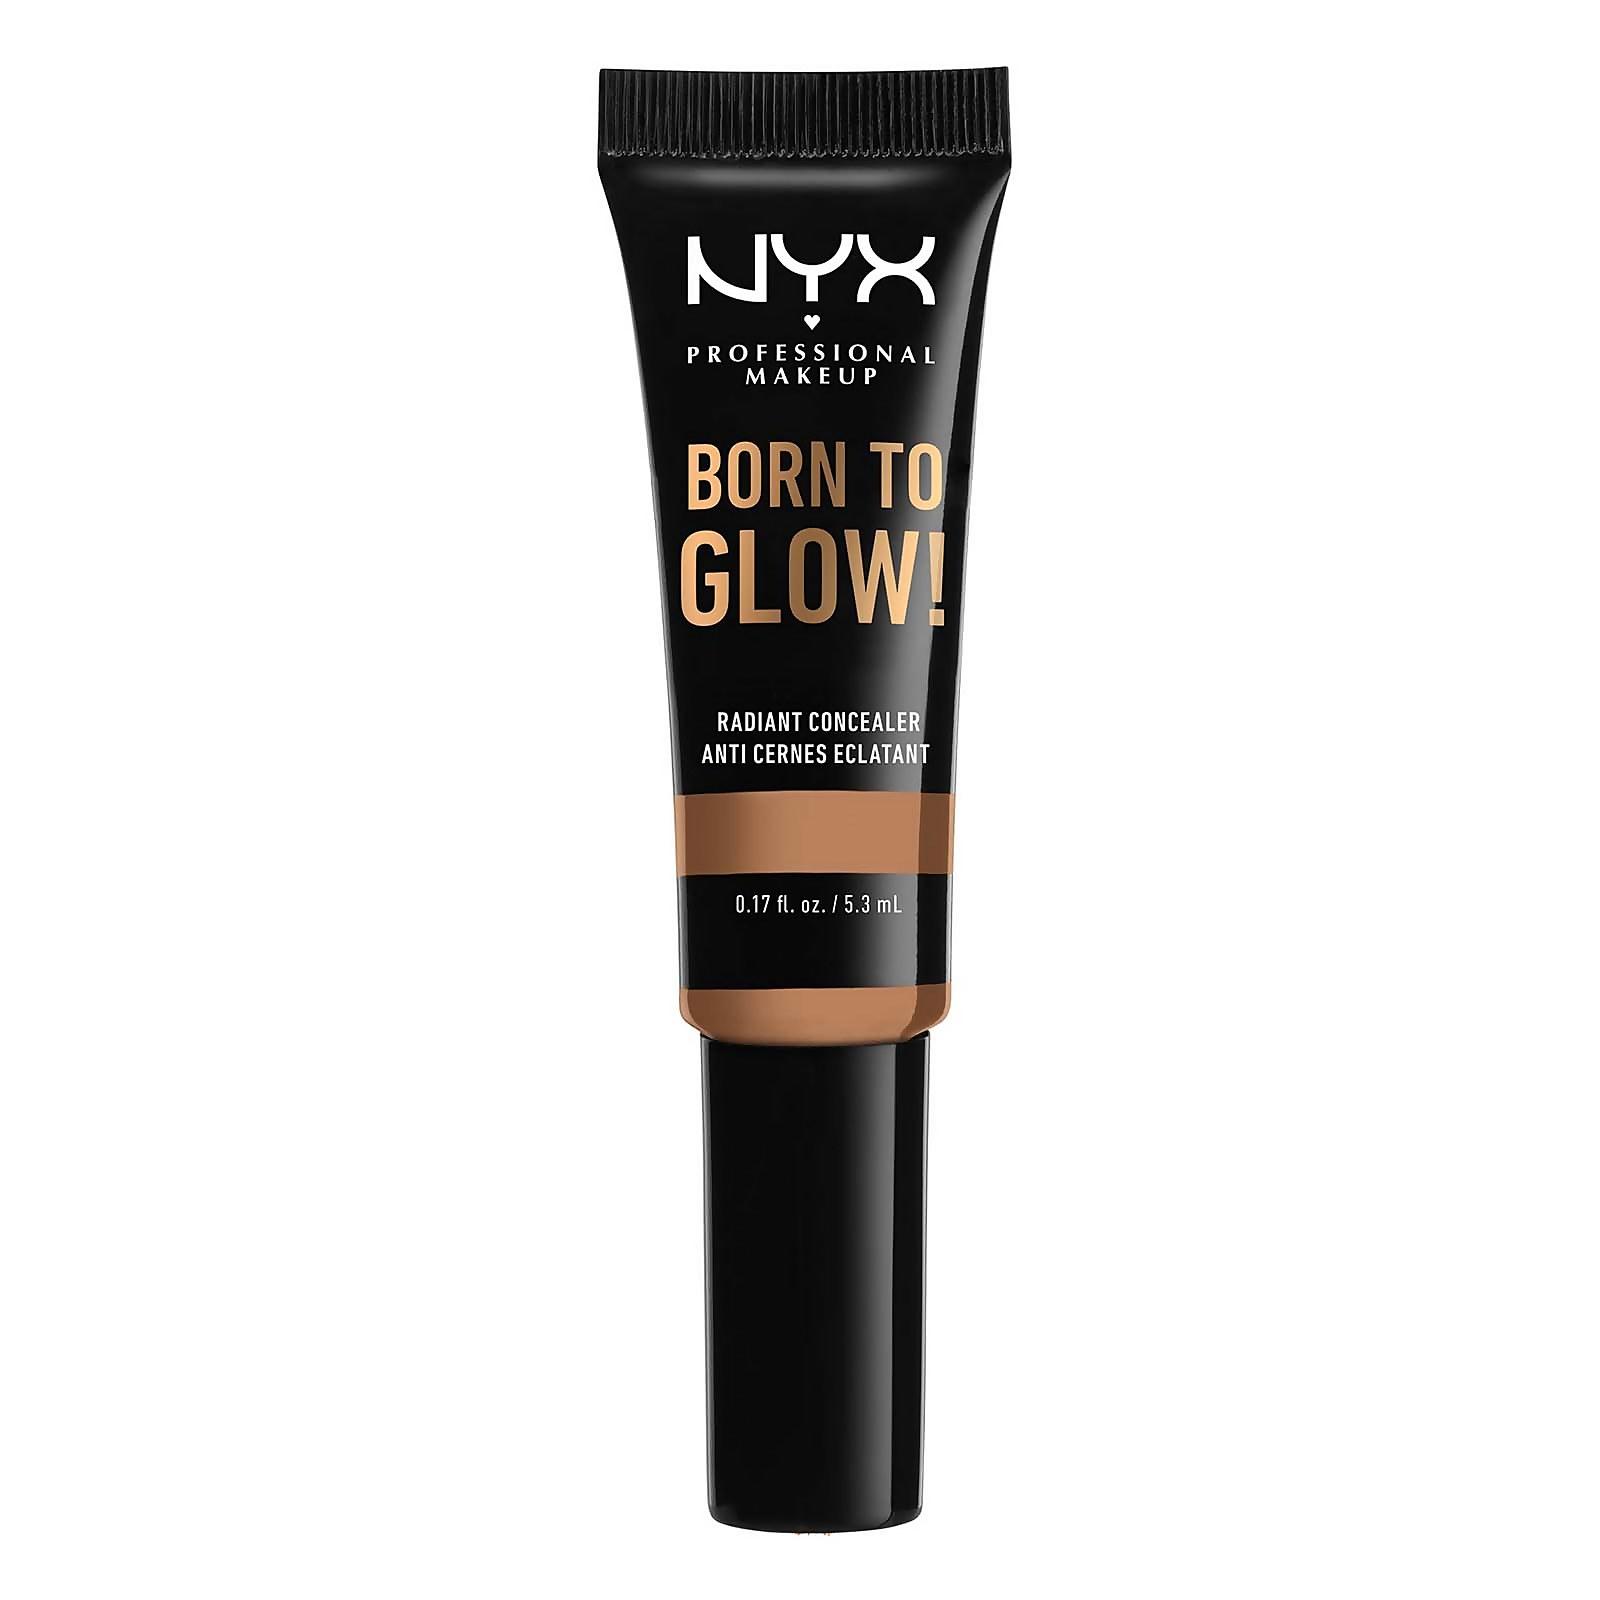 Купить NYX Professional Makeup Born to Glow Radiant Concealer (Various Shades) - Golden Honey